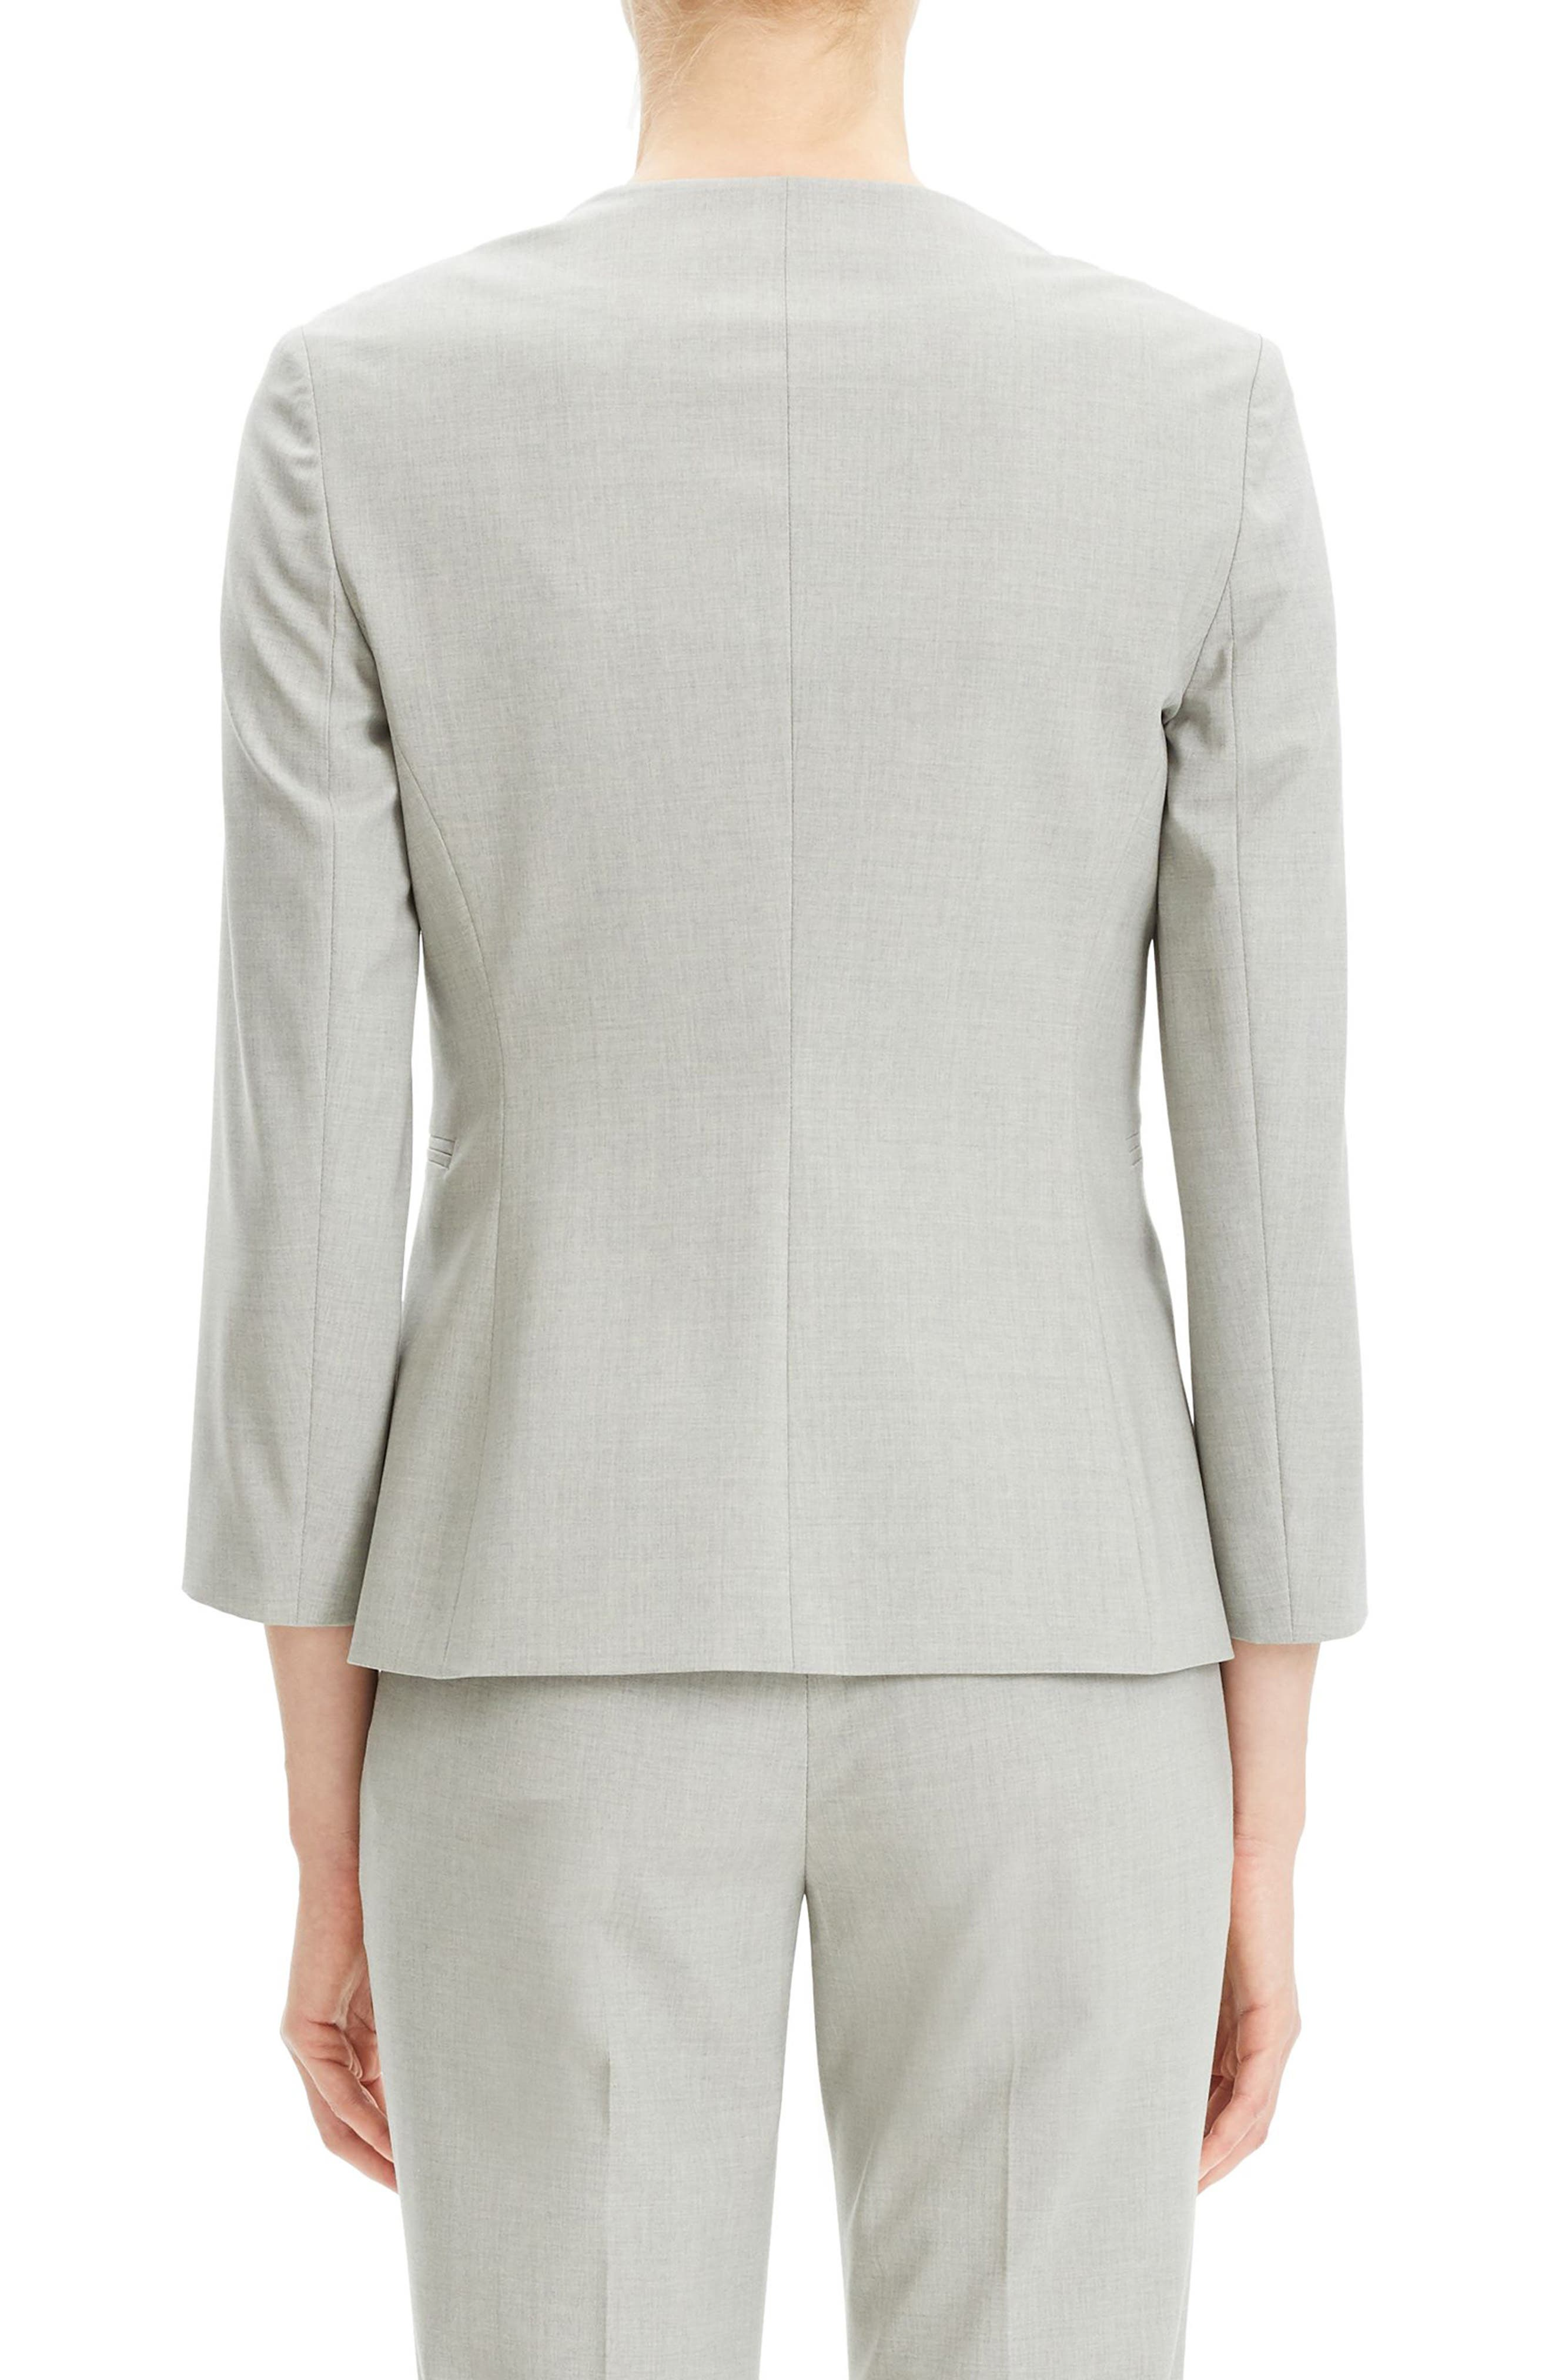 THEORY, Lindrayia B Good Wool Suit Jacket, Alternate thumbnail 2, color, LIGHT GREY MELANGE